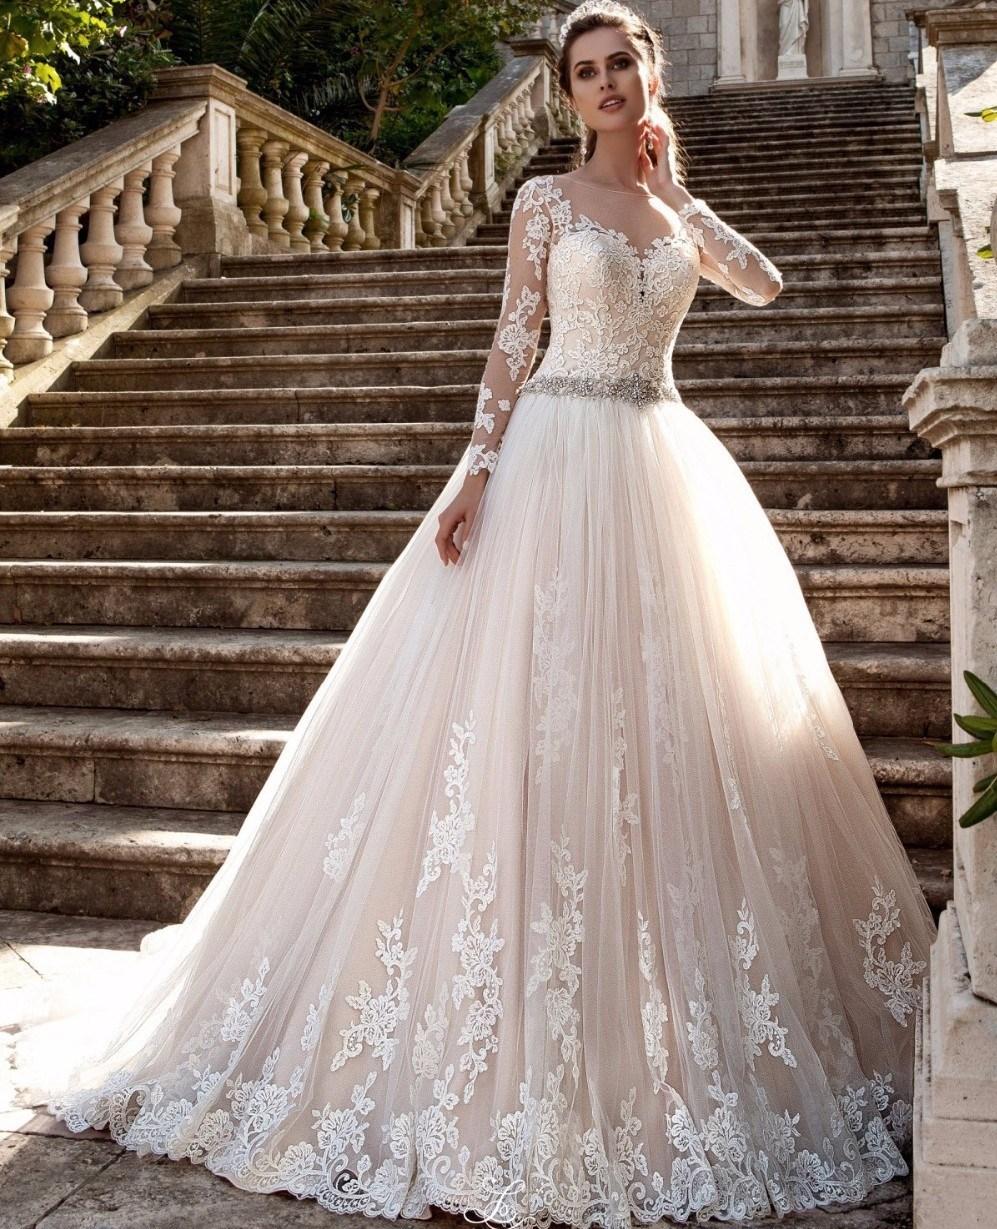 Hot Item O Neck Lace Beading Wedding Dress Long Sleeves Ruffle Bridal Gowns